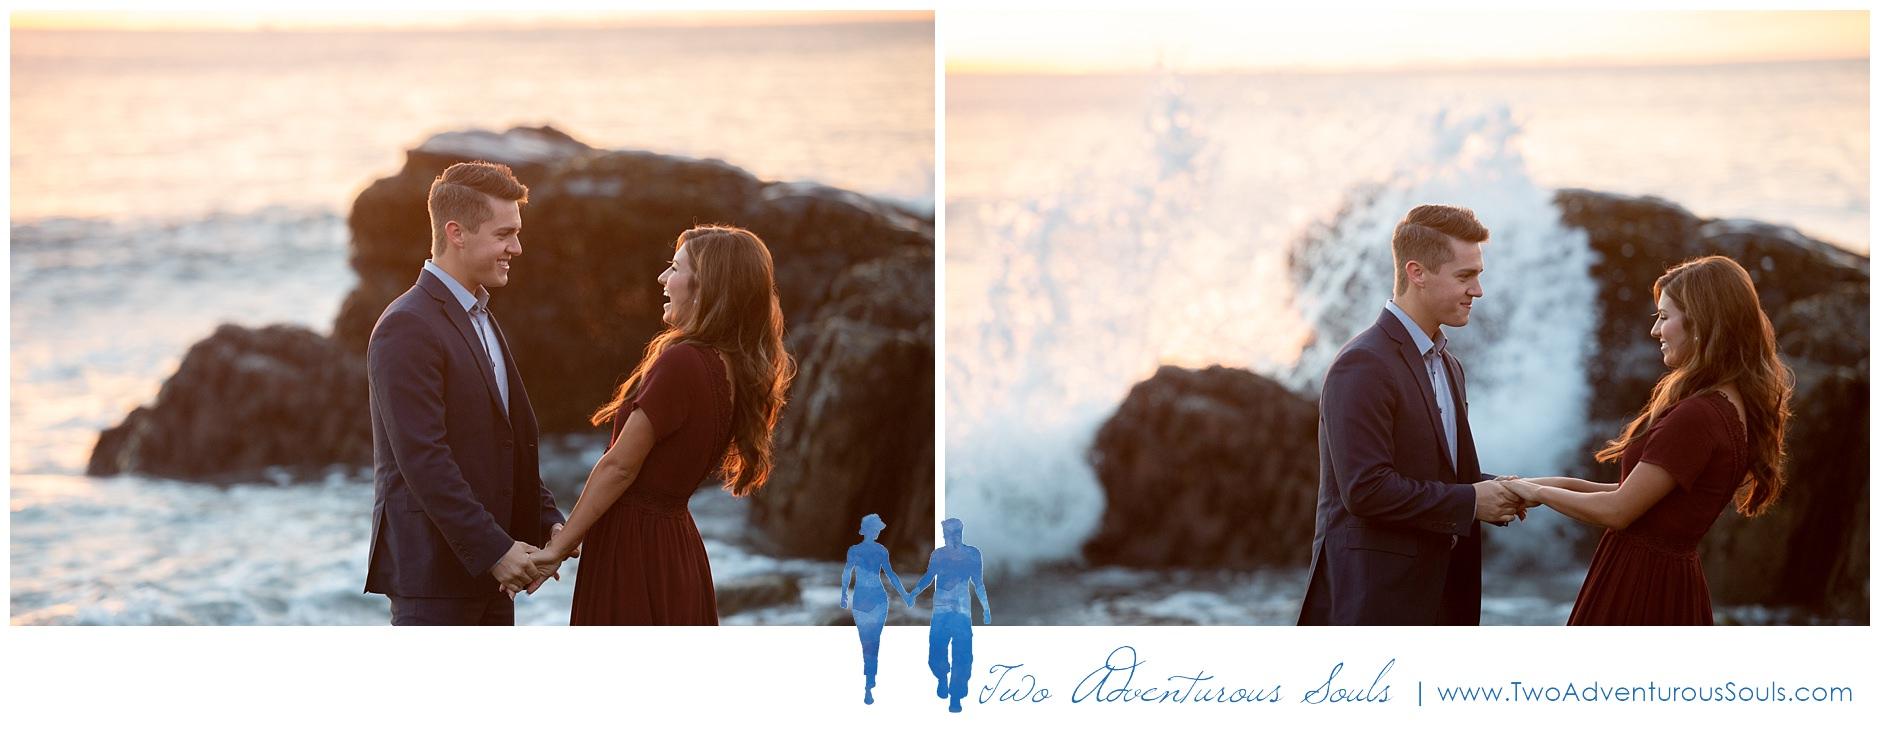 Destination Wedding, Carlin Bates, Evan Stewart, Maine Wedding Photographers, Two Adventurous Souls_0006.jpg